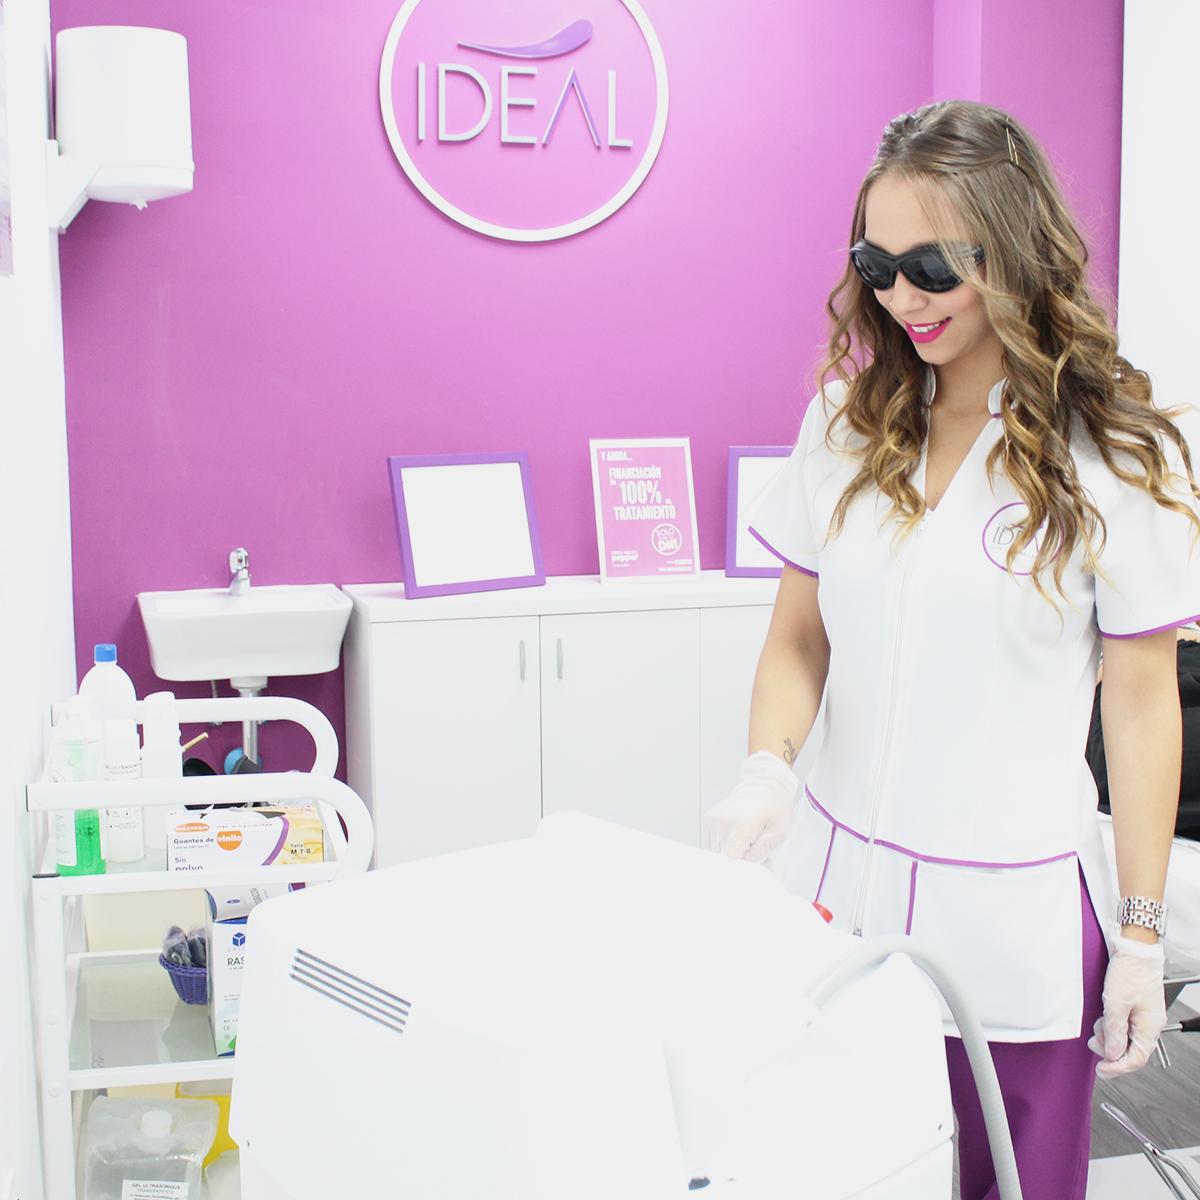 depilación brasileña o depilación del pubis parcial con láser